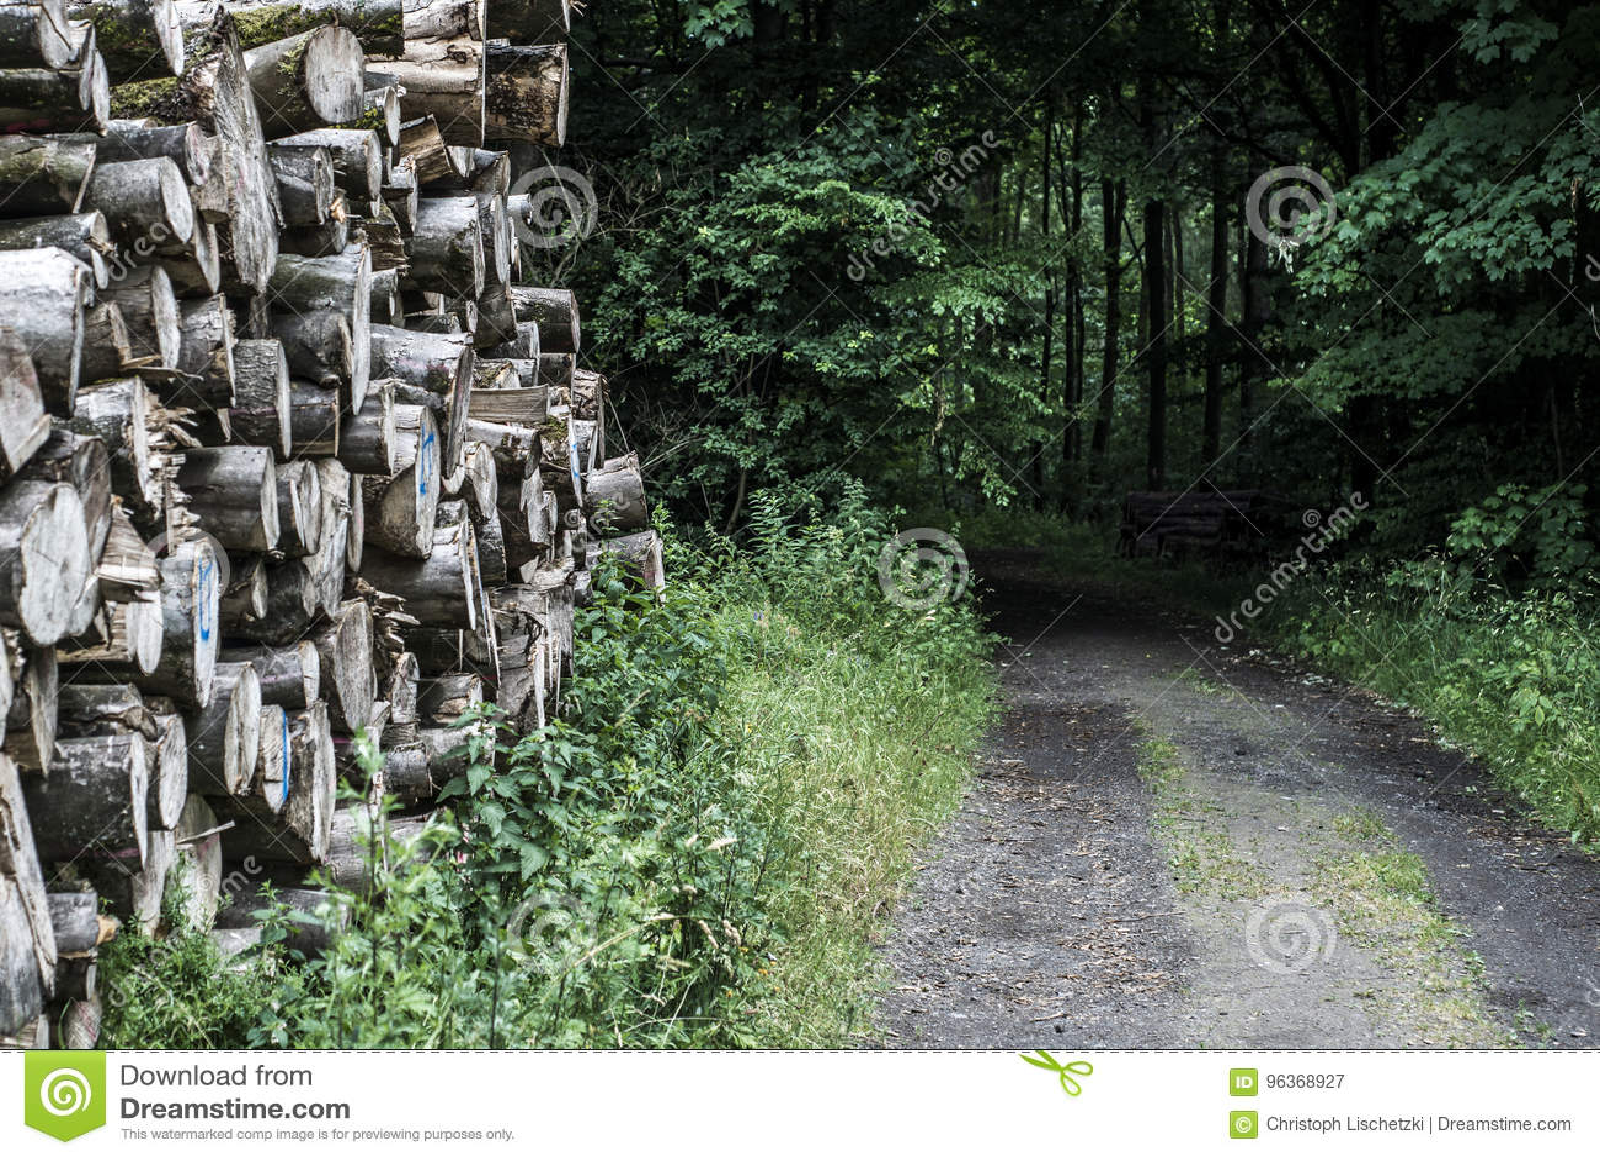 Log pile stack forest wood track mud road offroad way puddle landscape background